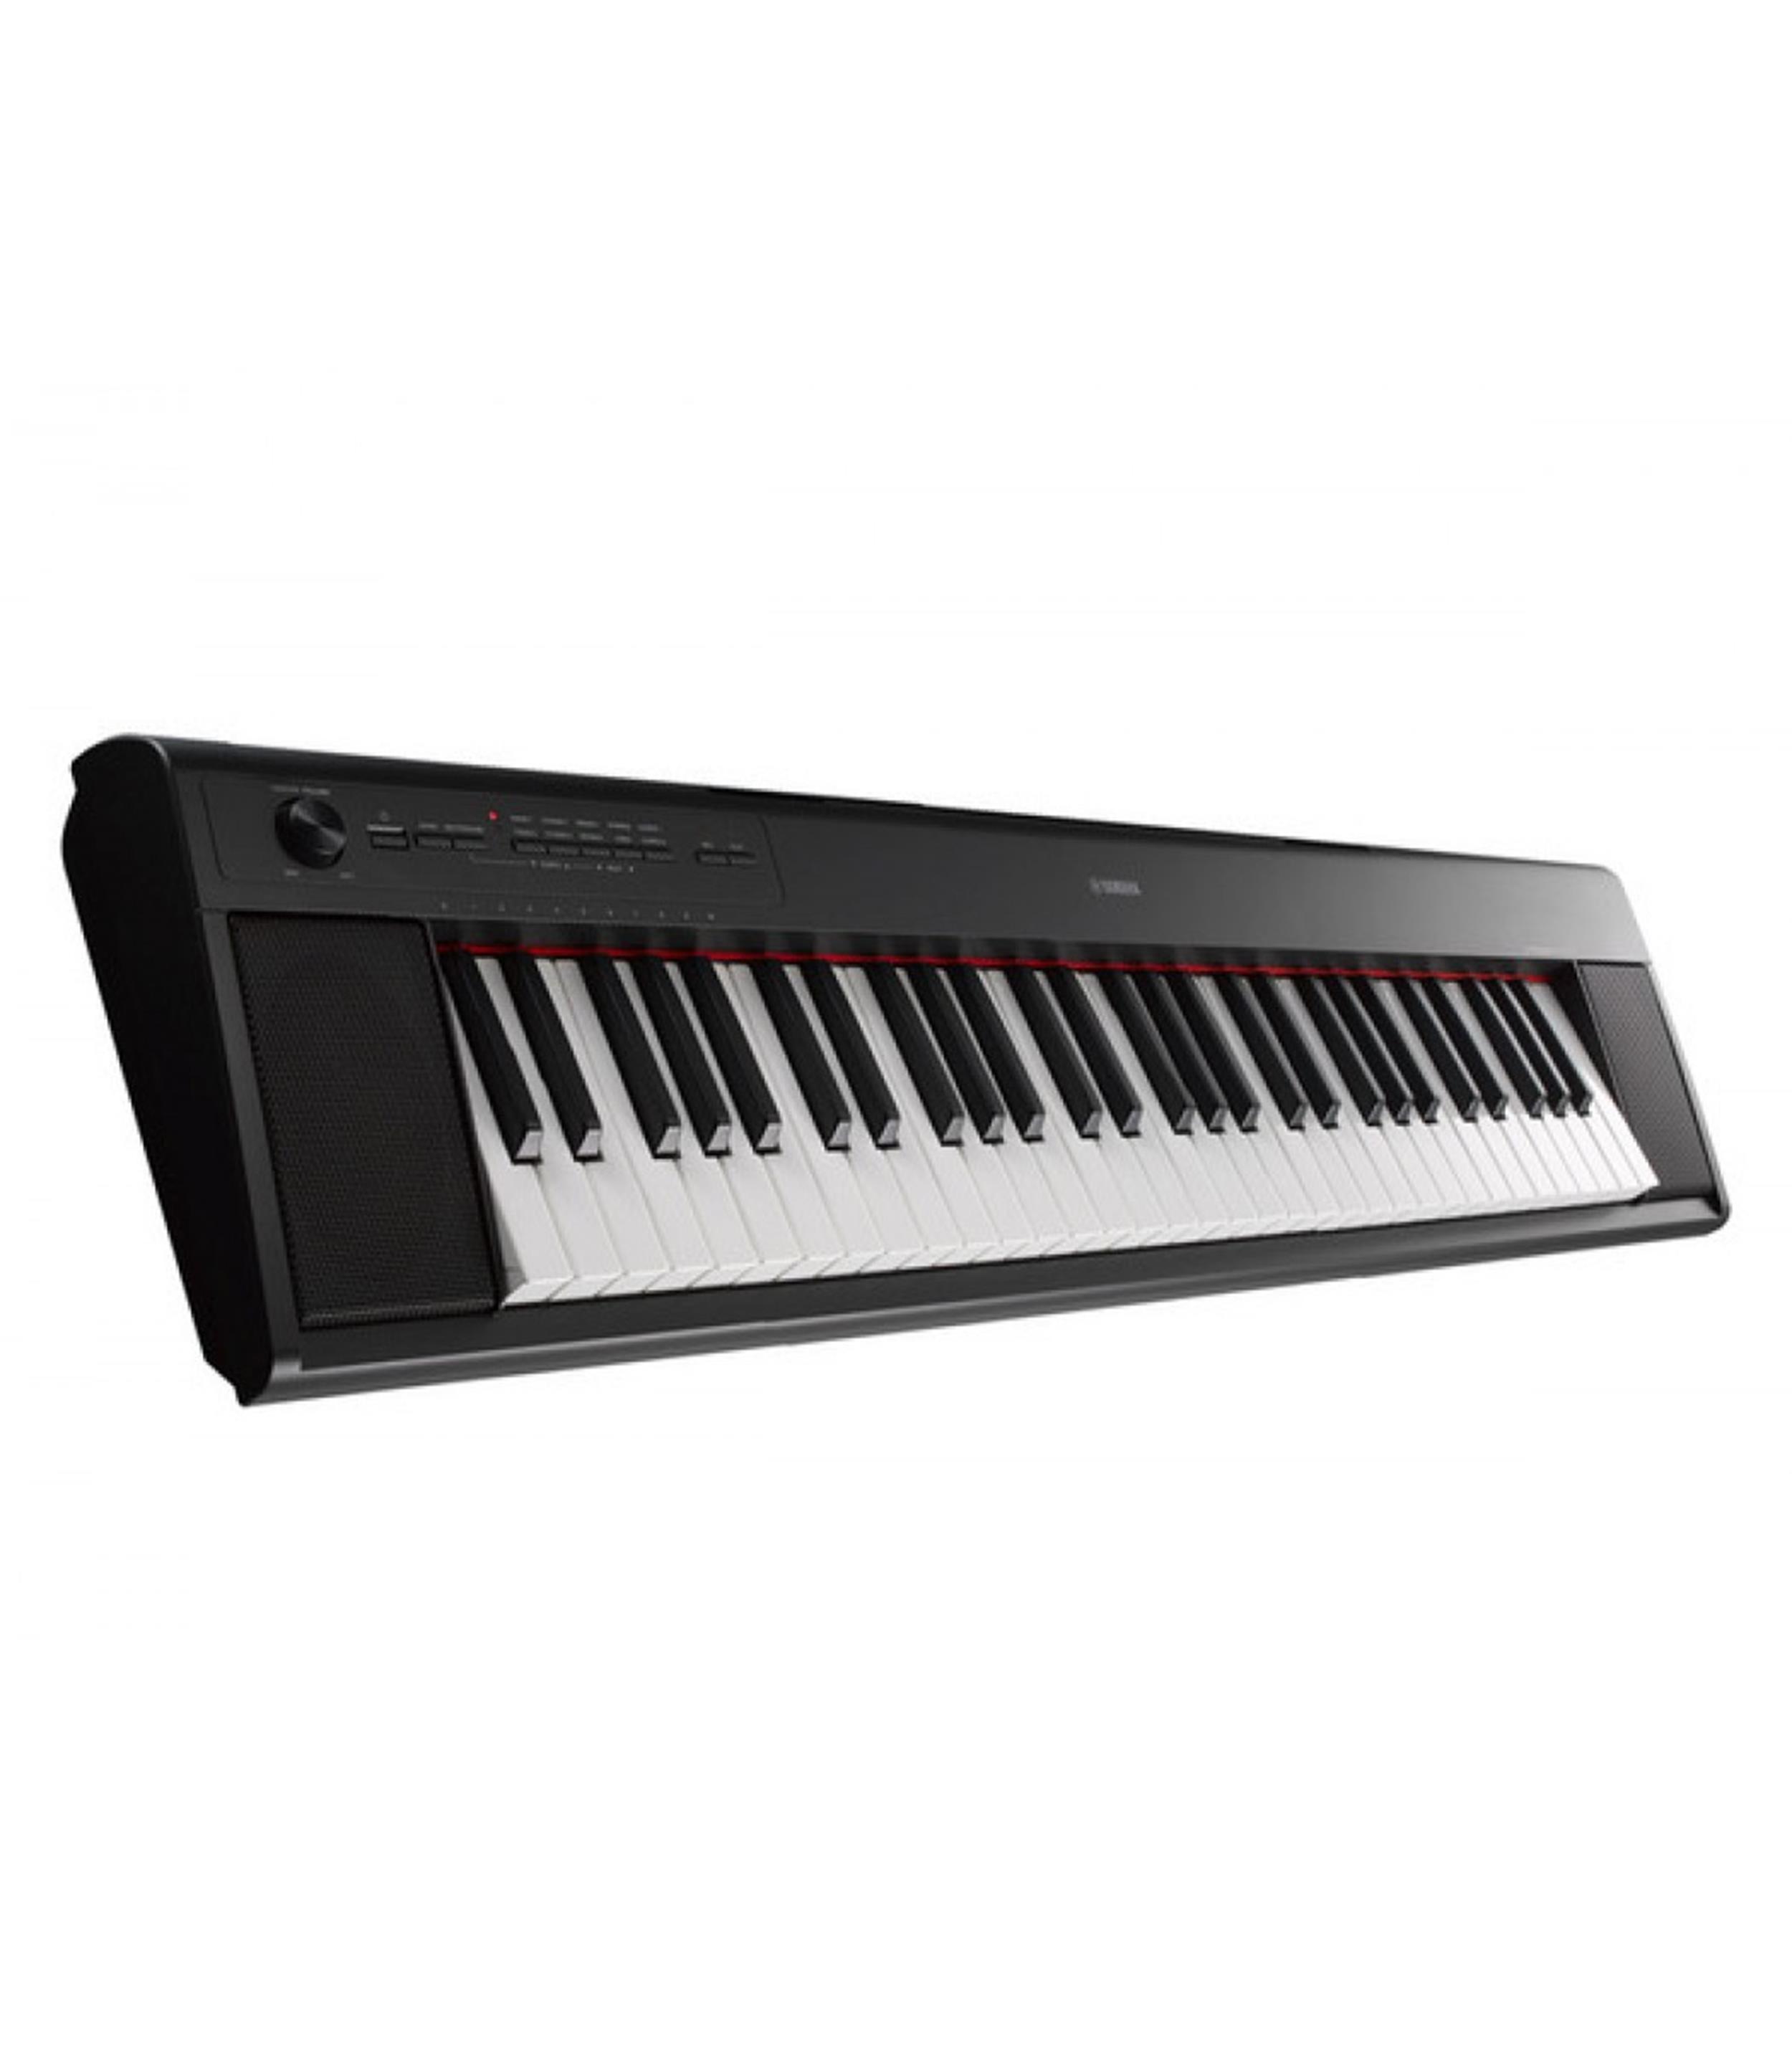 YAMAHA NP12 PIAGGERO PIANOFORTE DIGITALE 61 TASTI